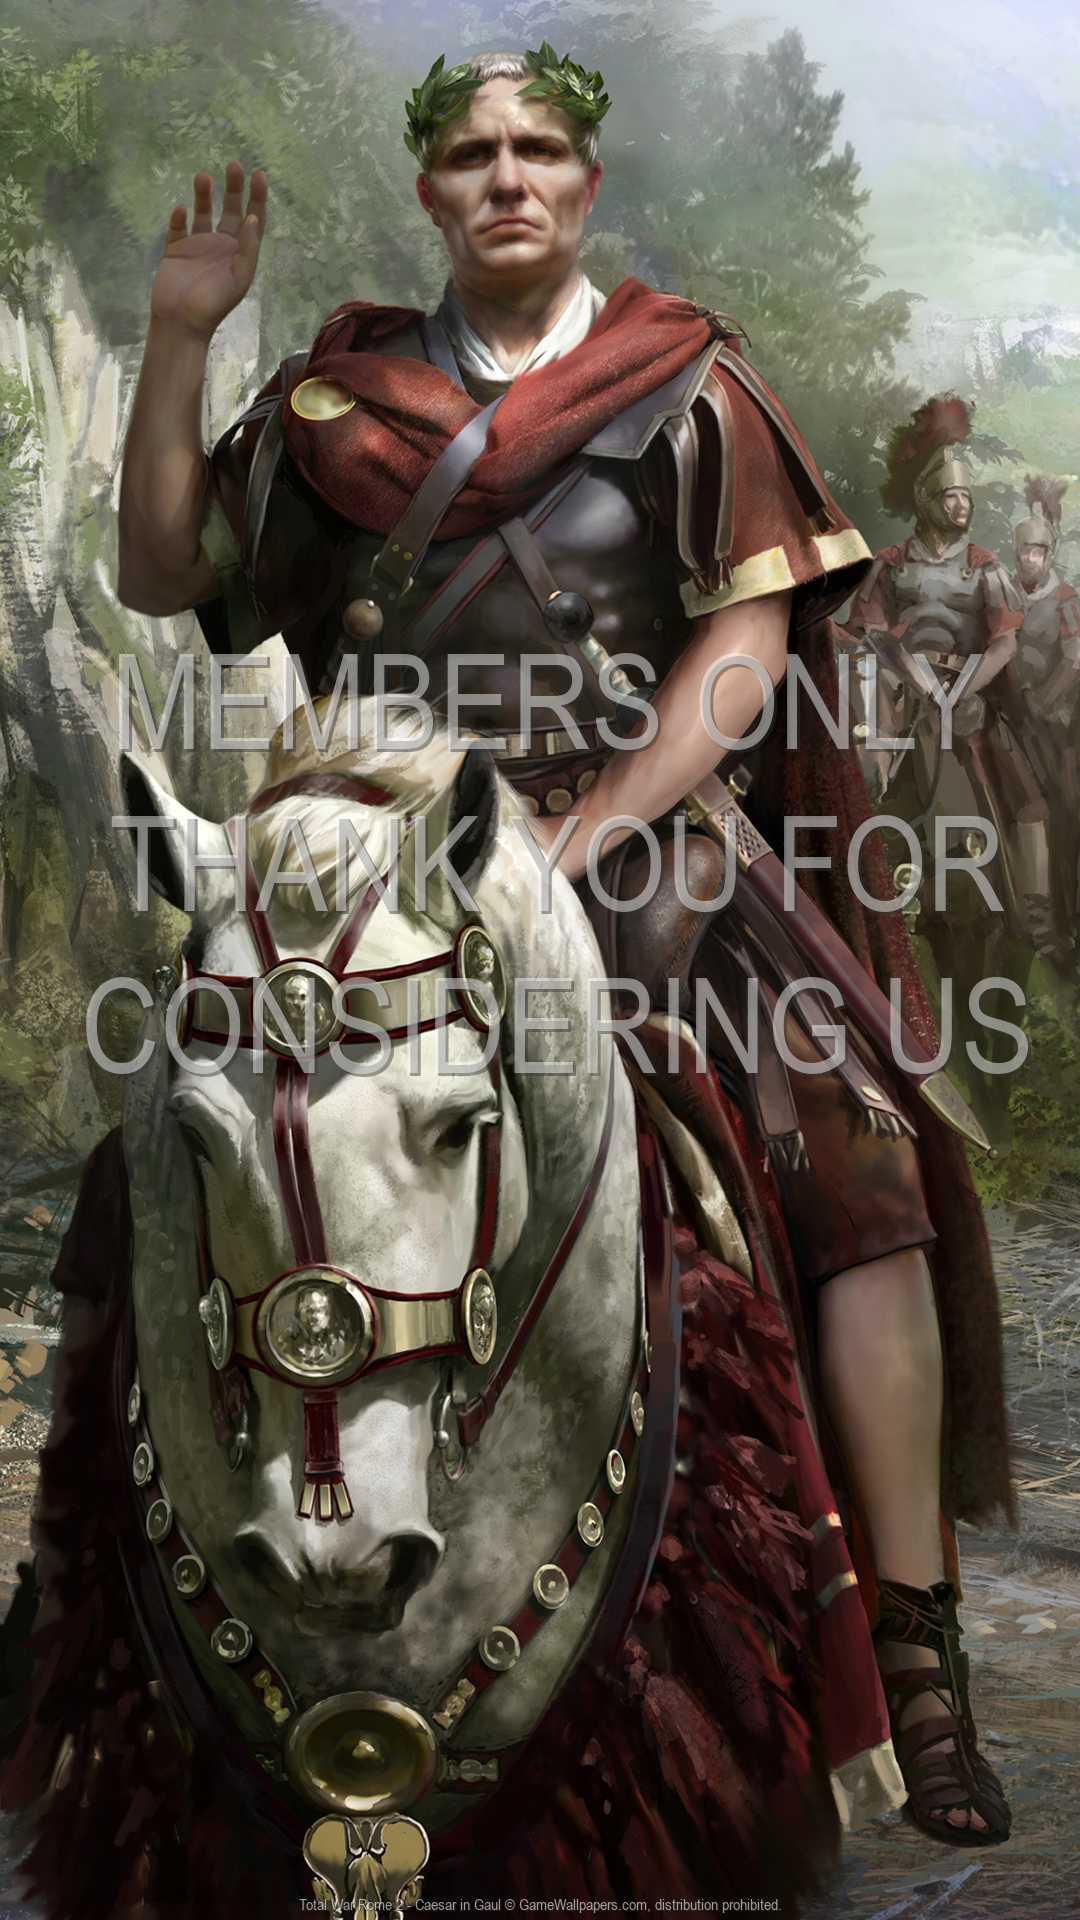 Total War: Rome 2 - Caesar in Gaul 1080p Vertical Mobile wallpaper or background 01